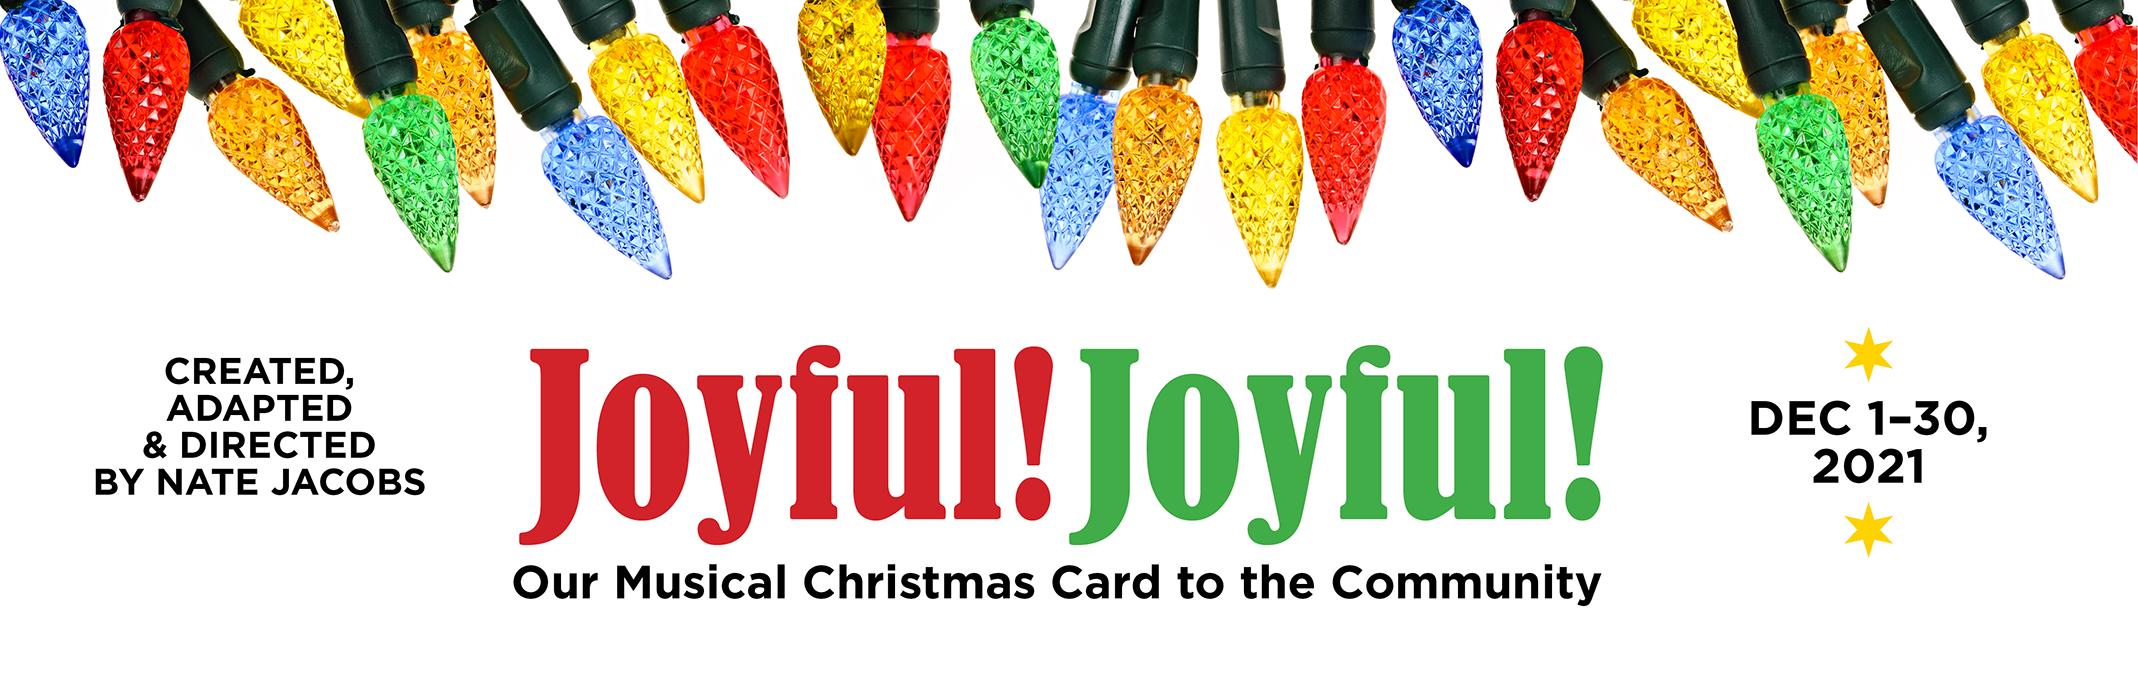 Joyful! Joyfu! Our Musical Christmas Card to the Community; December 1-30, 2021